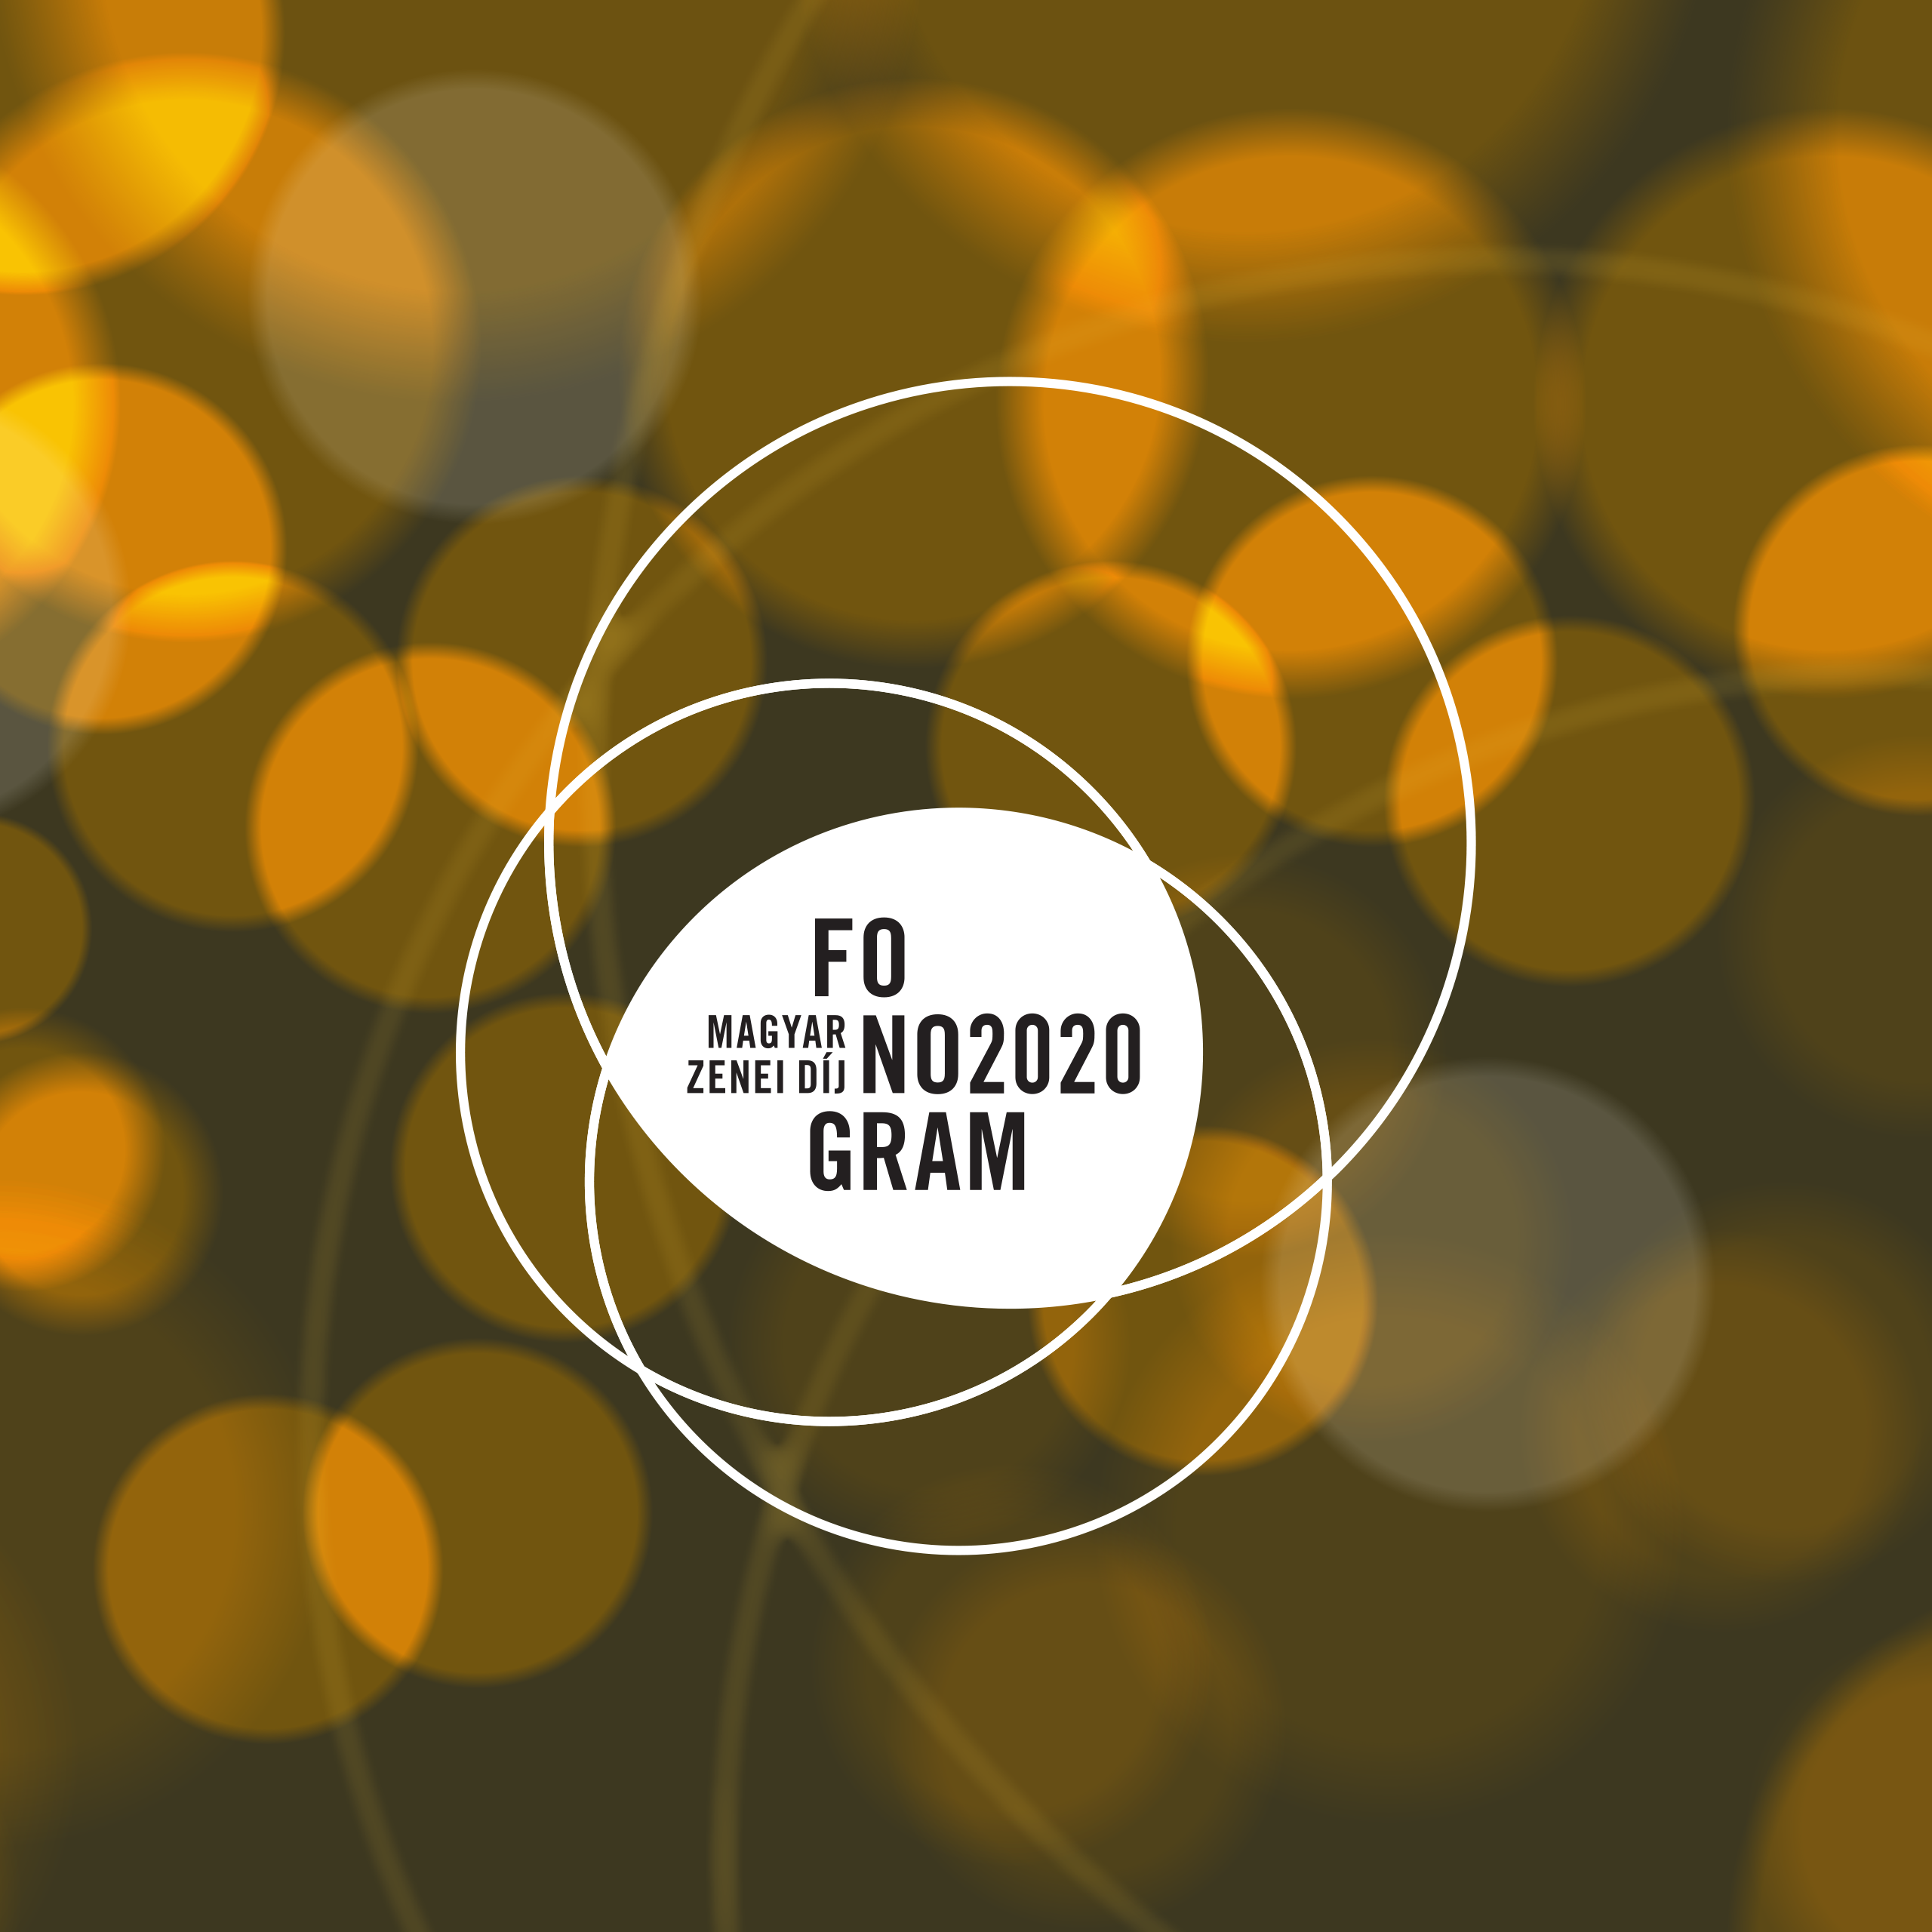 fonogram-2020-arculat-napsarga.png